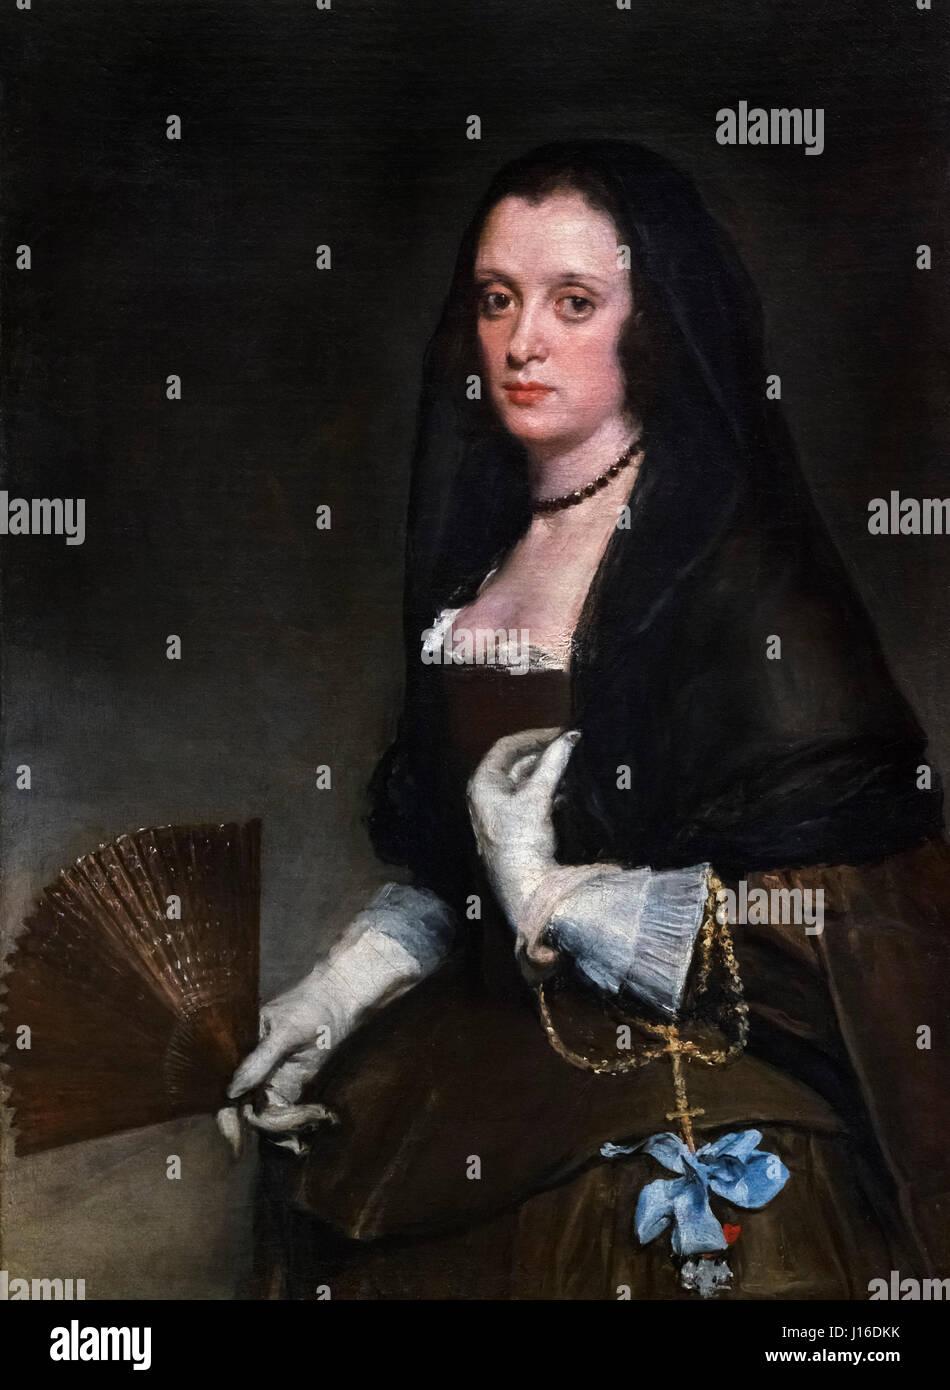 "Velázquez. ""La dama con un ventilador' de Diego Velázquez (1599-1660), óleo sobre lienzo, Imagen De Stock"